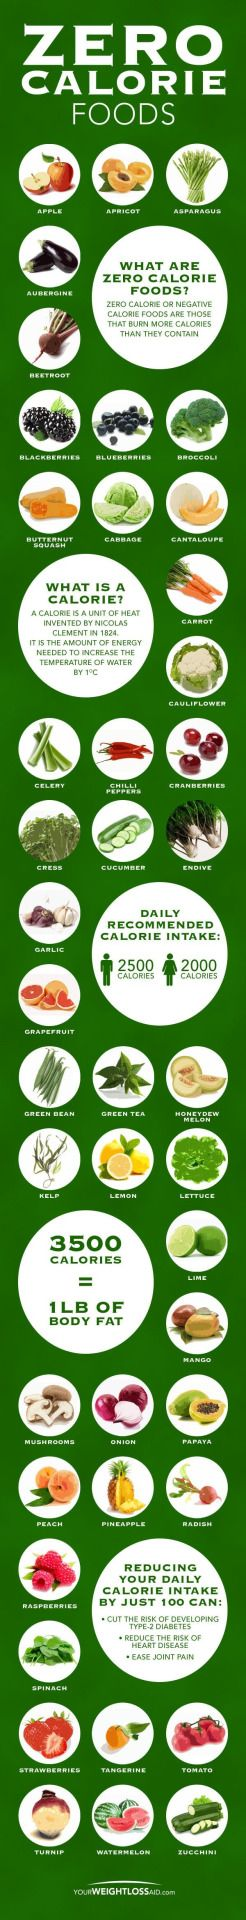 how to get more calories vegetarian